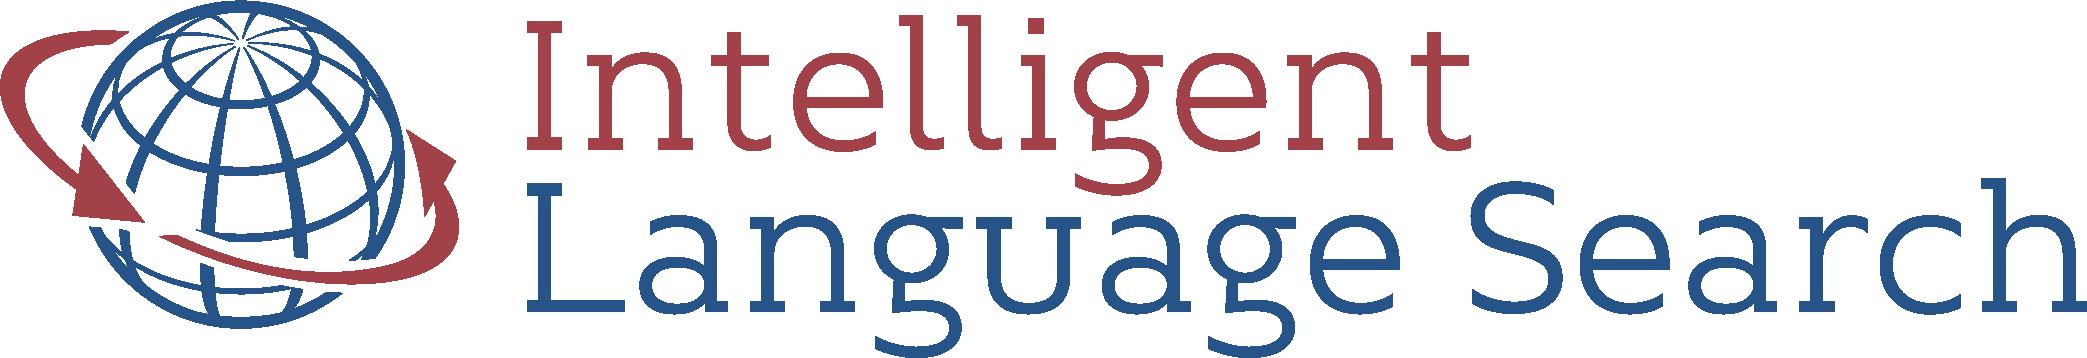 https://job-matrix.dk/wp-content/uploads/2019/02/Intelligent-Language-Search_4F-outline.png